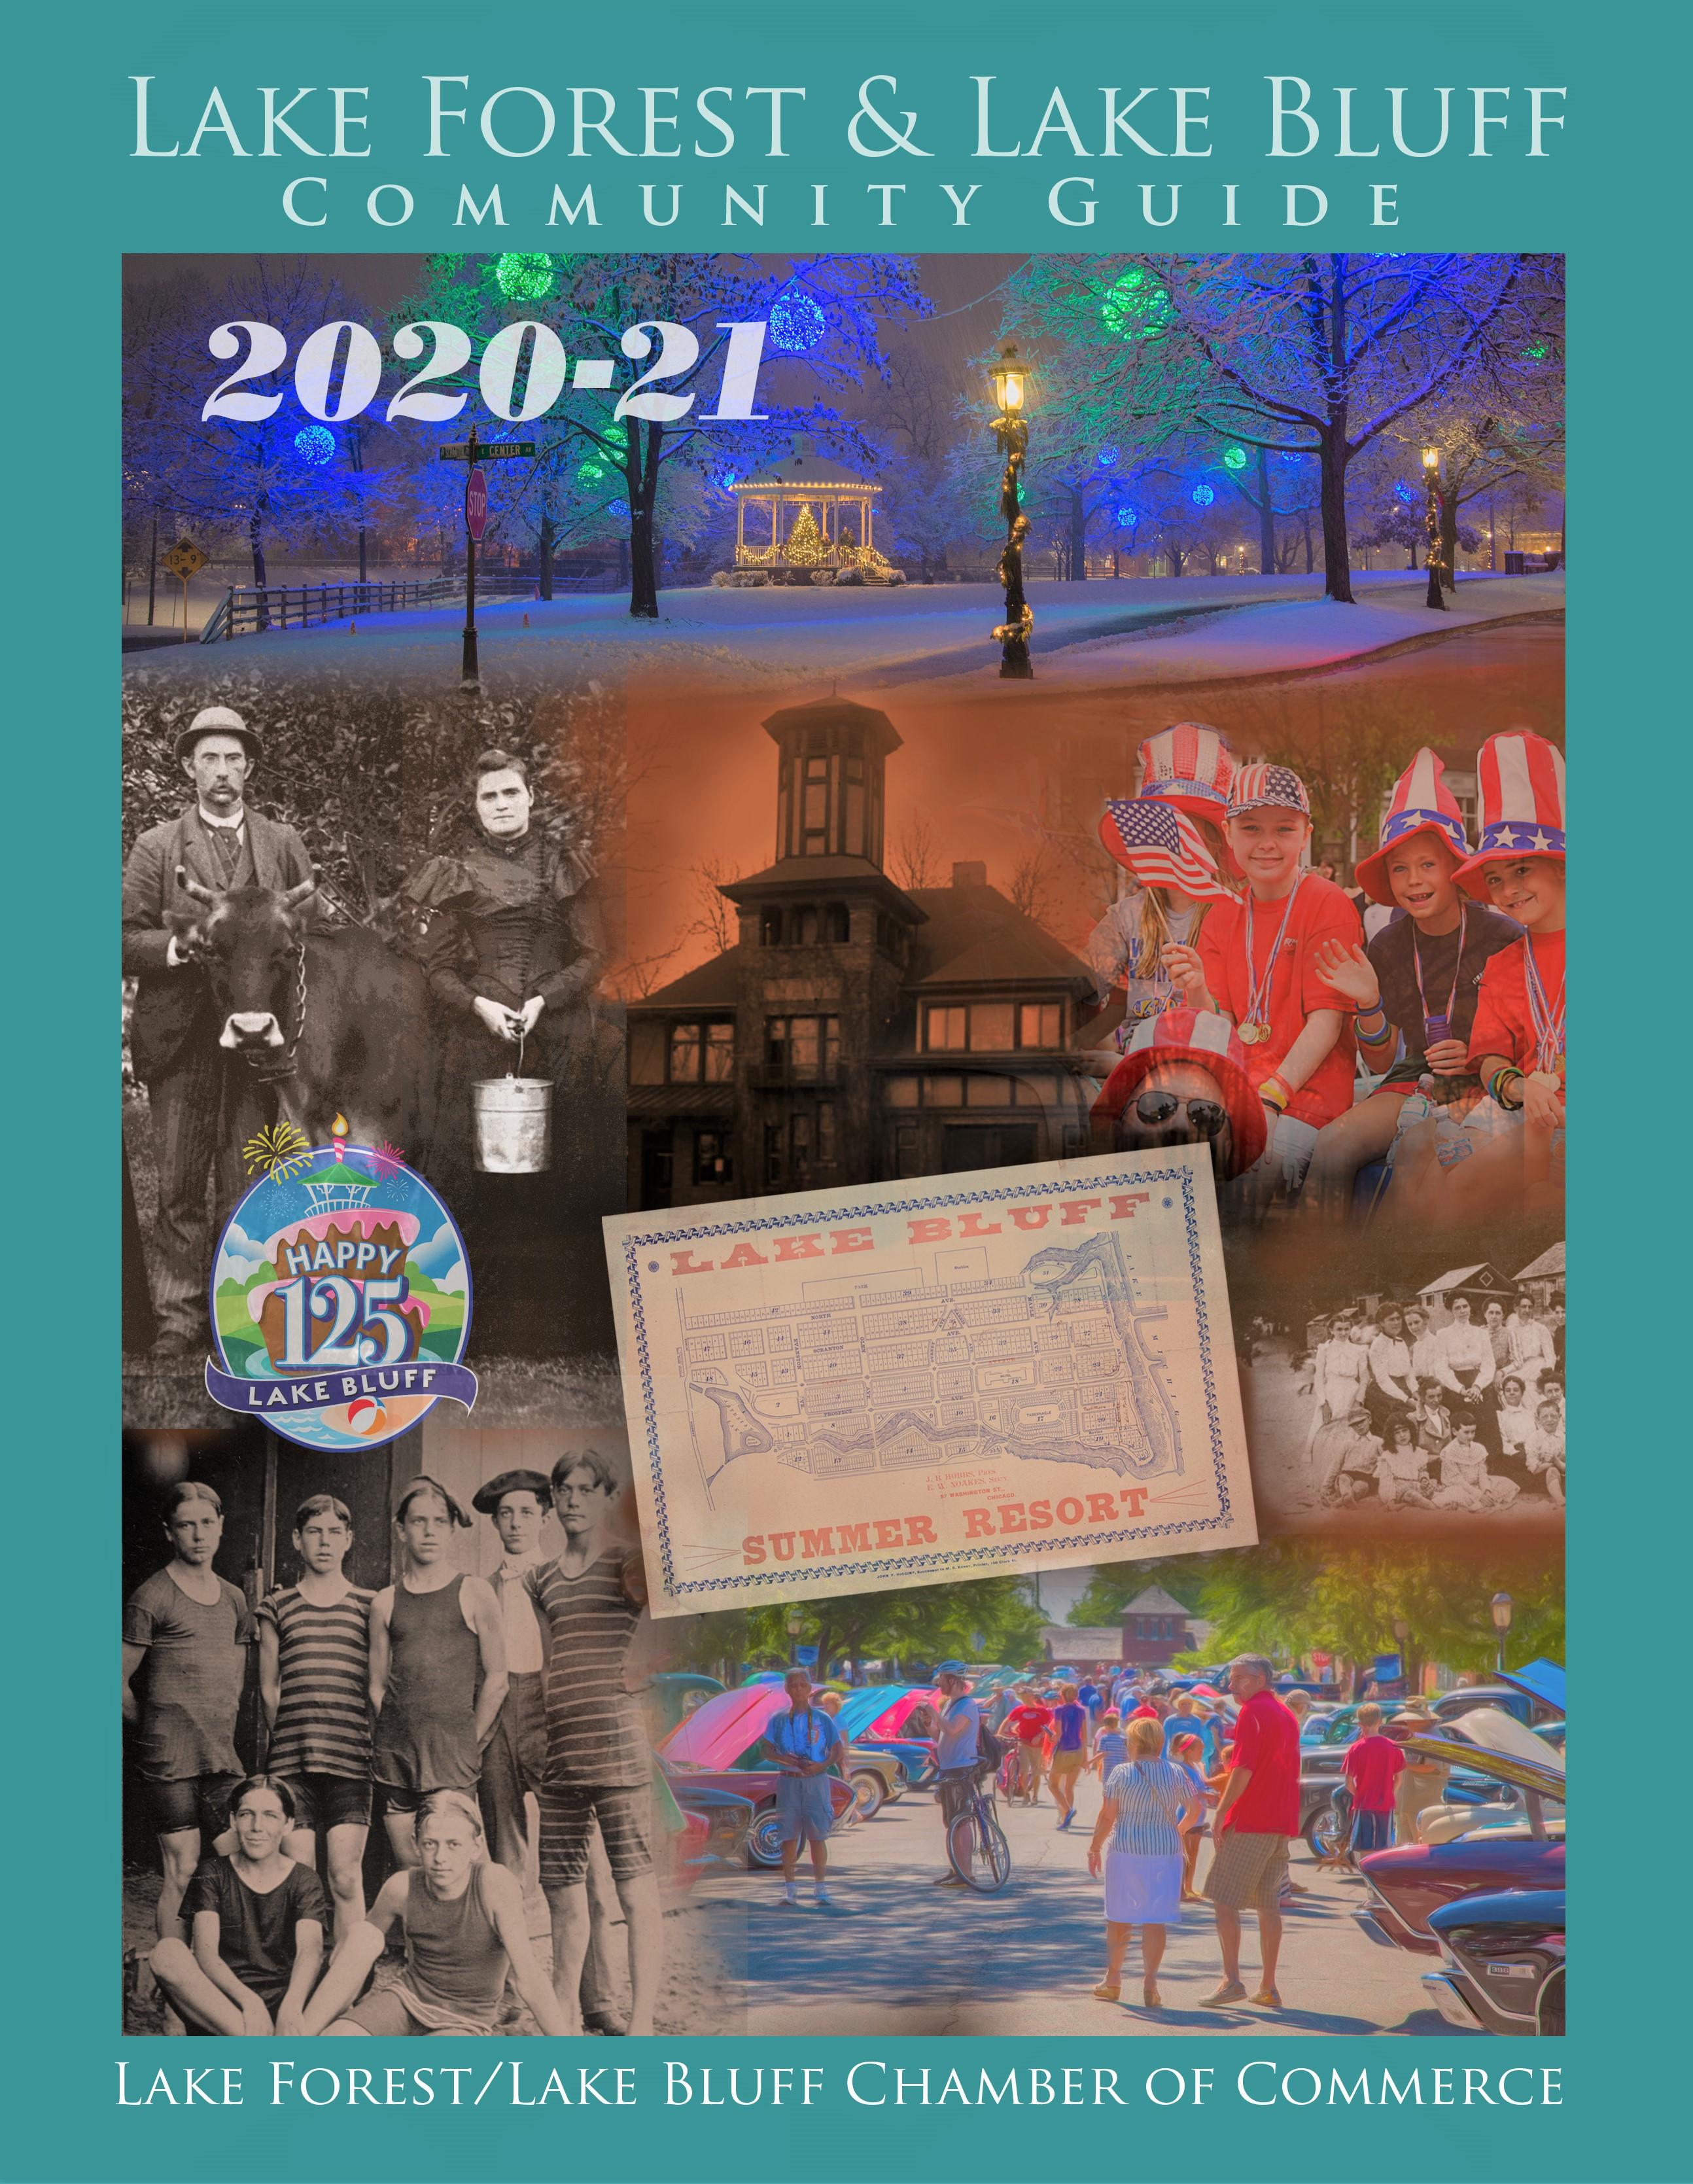 2020 Cover LF-LB Community Guide lightened